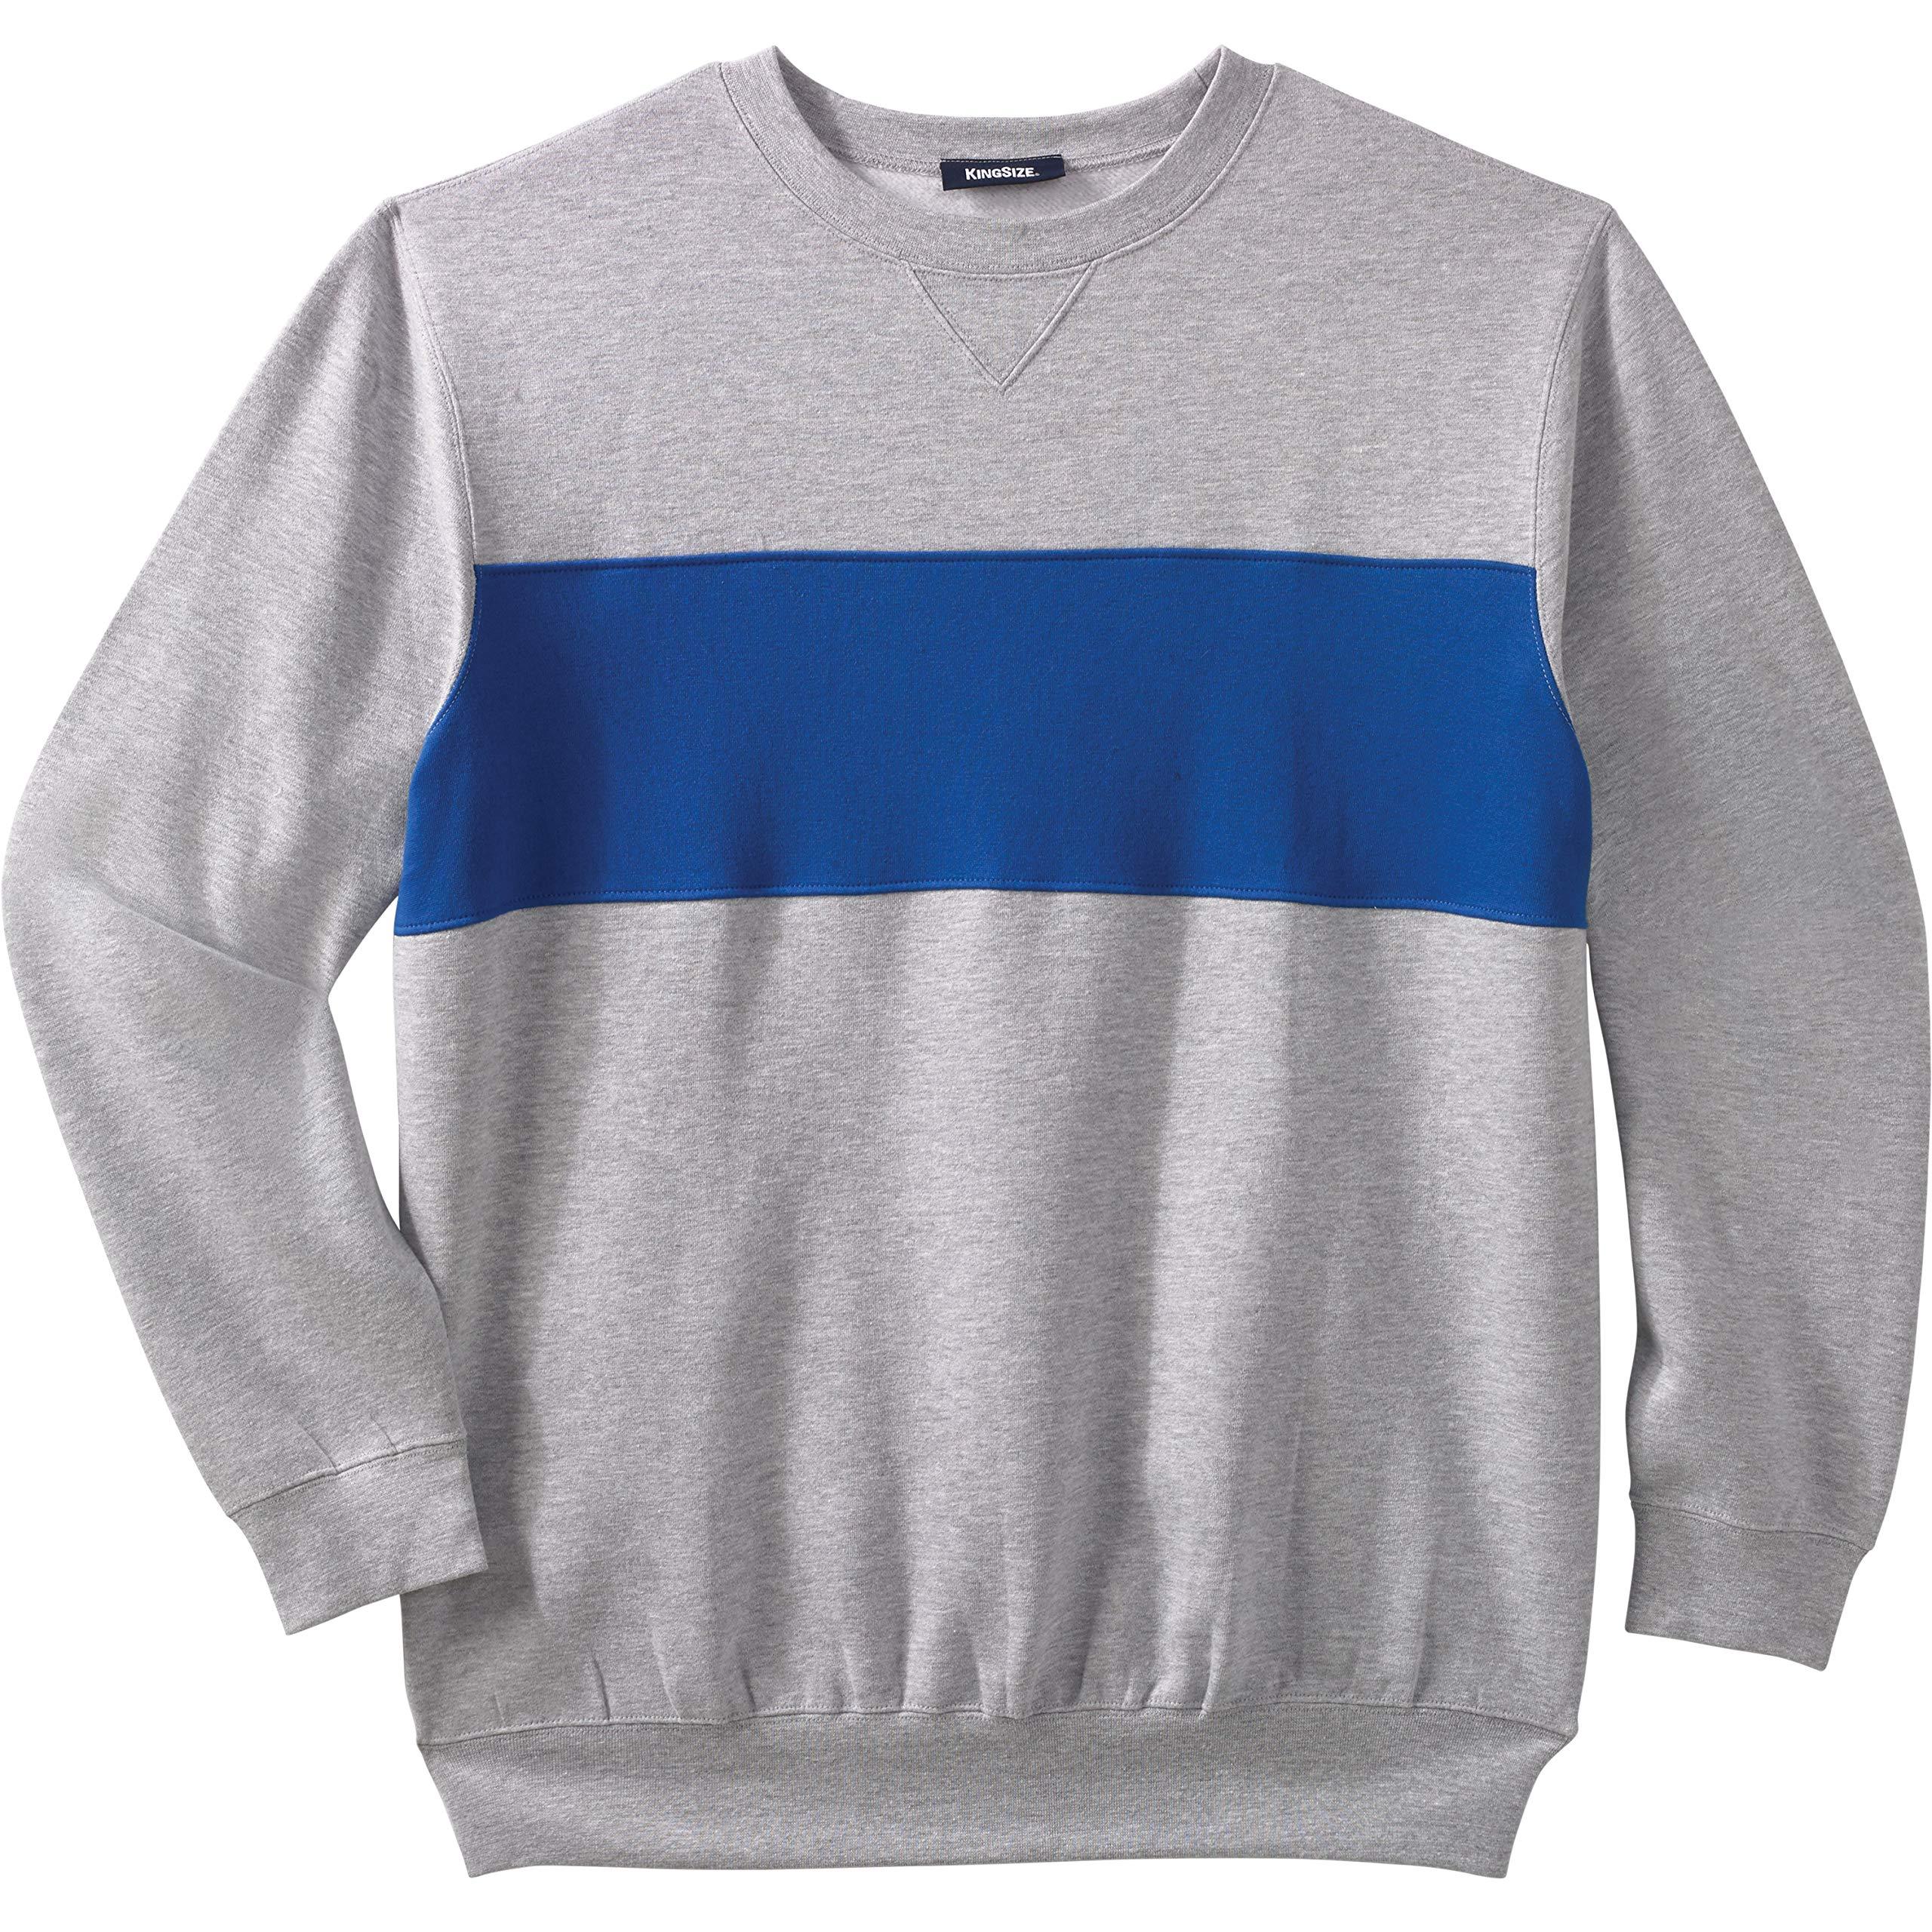 KingSize Men's Big & Tall Fleece Crewneck Sweatshirt